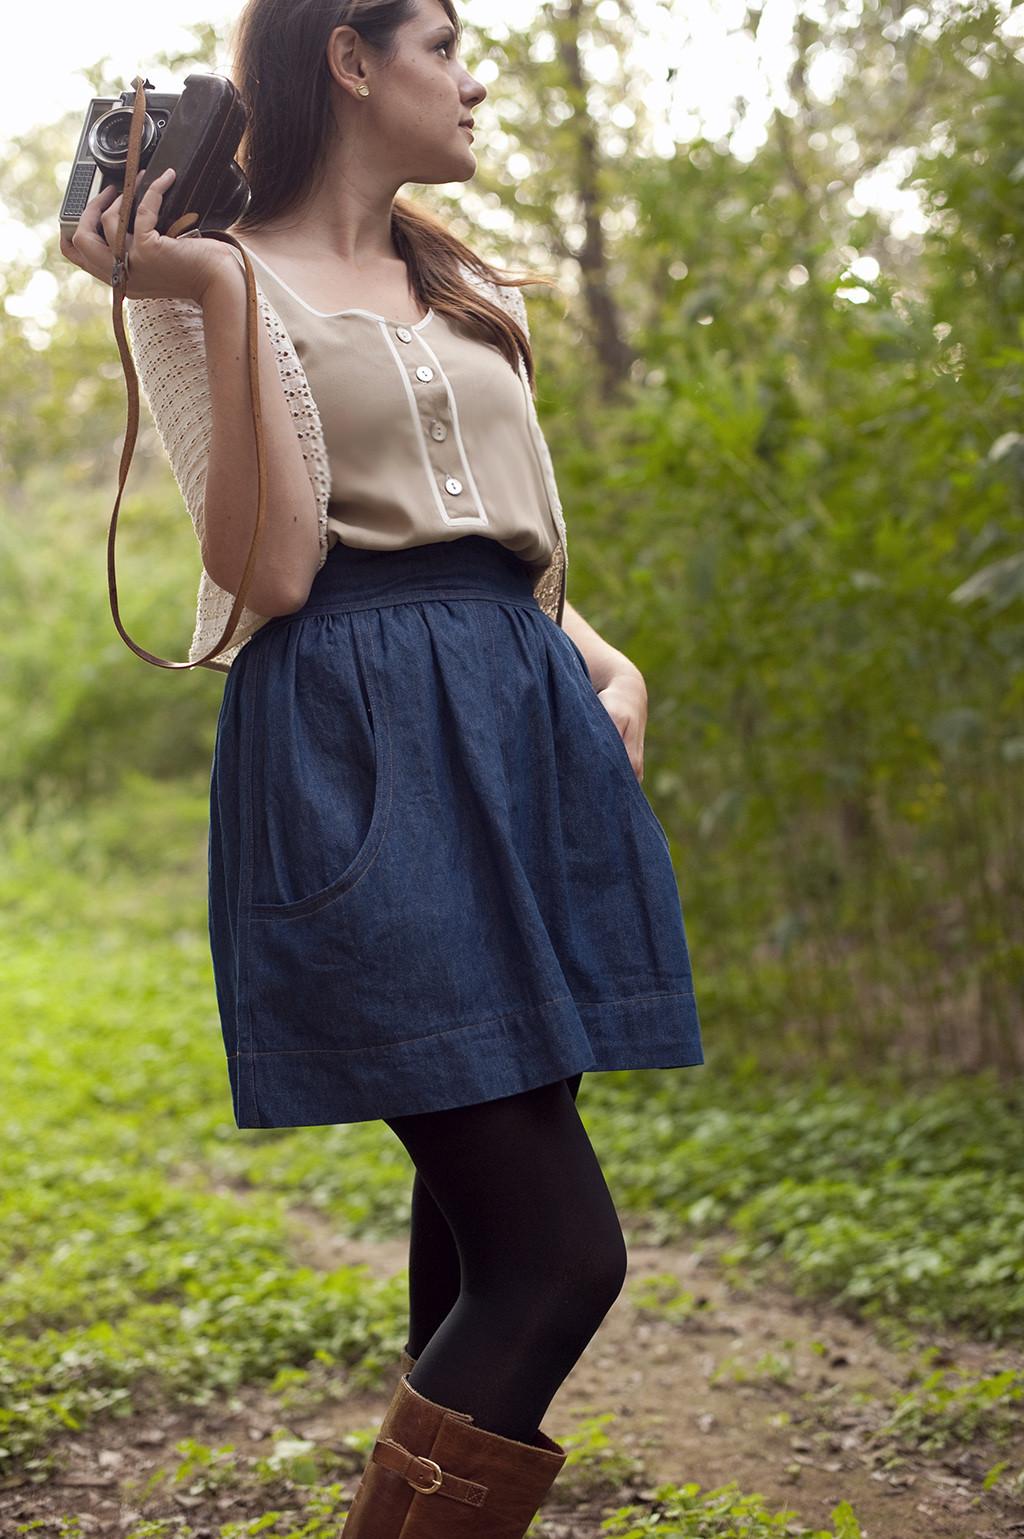 Itch to Stitch Birthday Celebration Featured Designer - Megan Nielsen - Brumby skirt